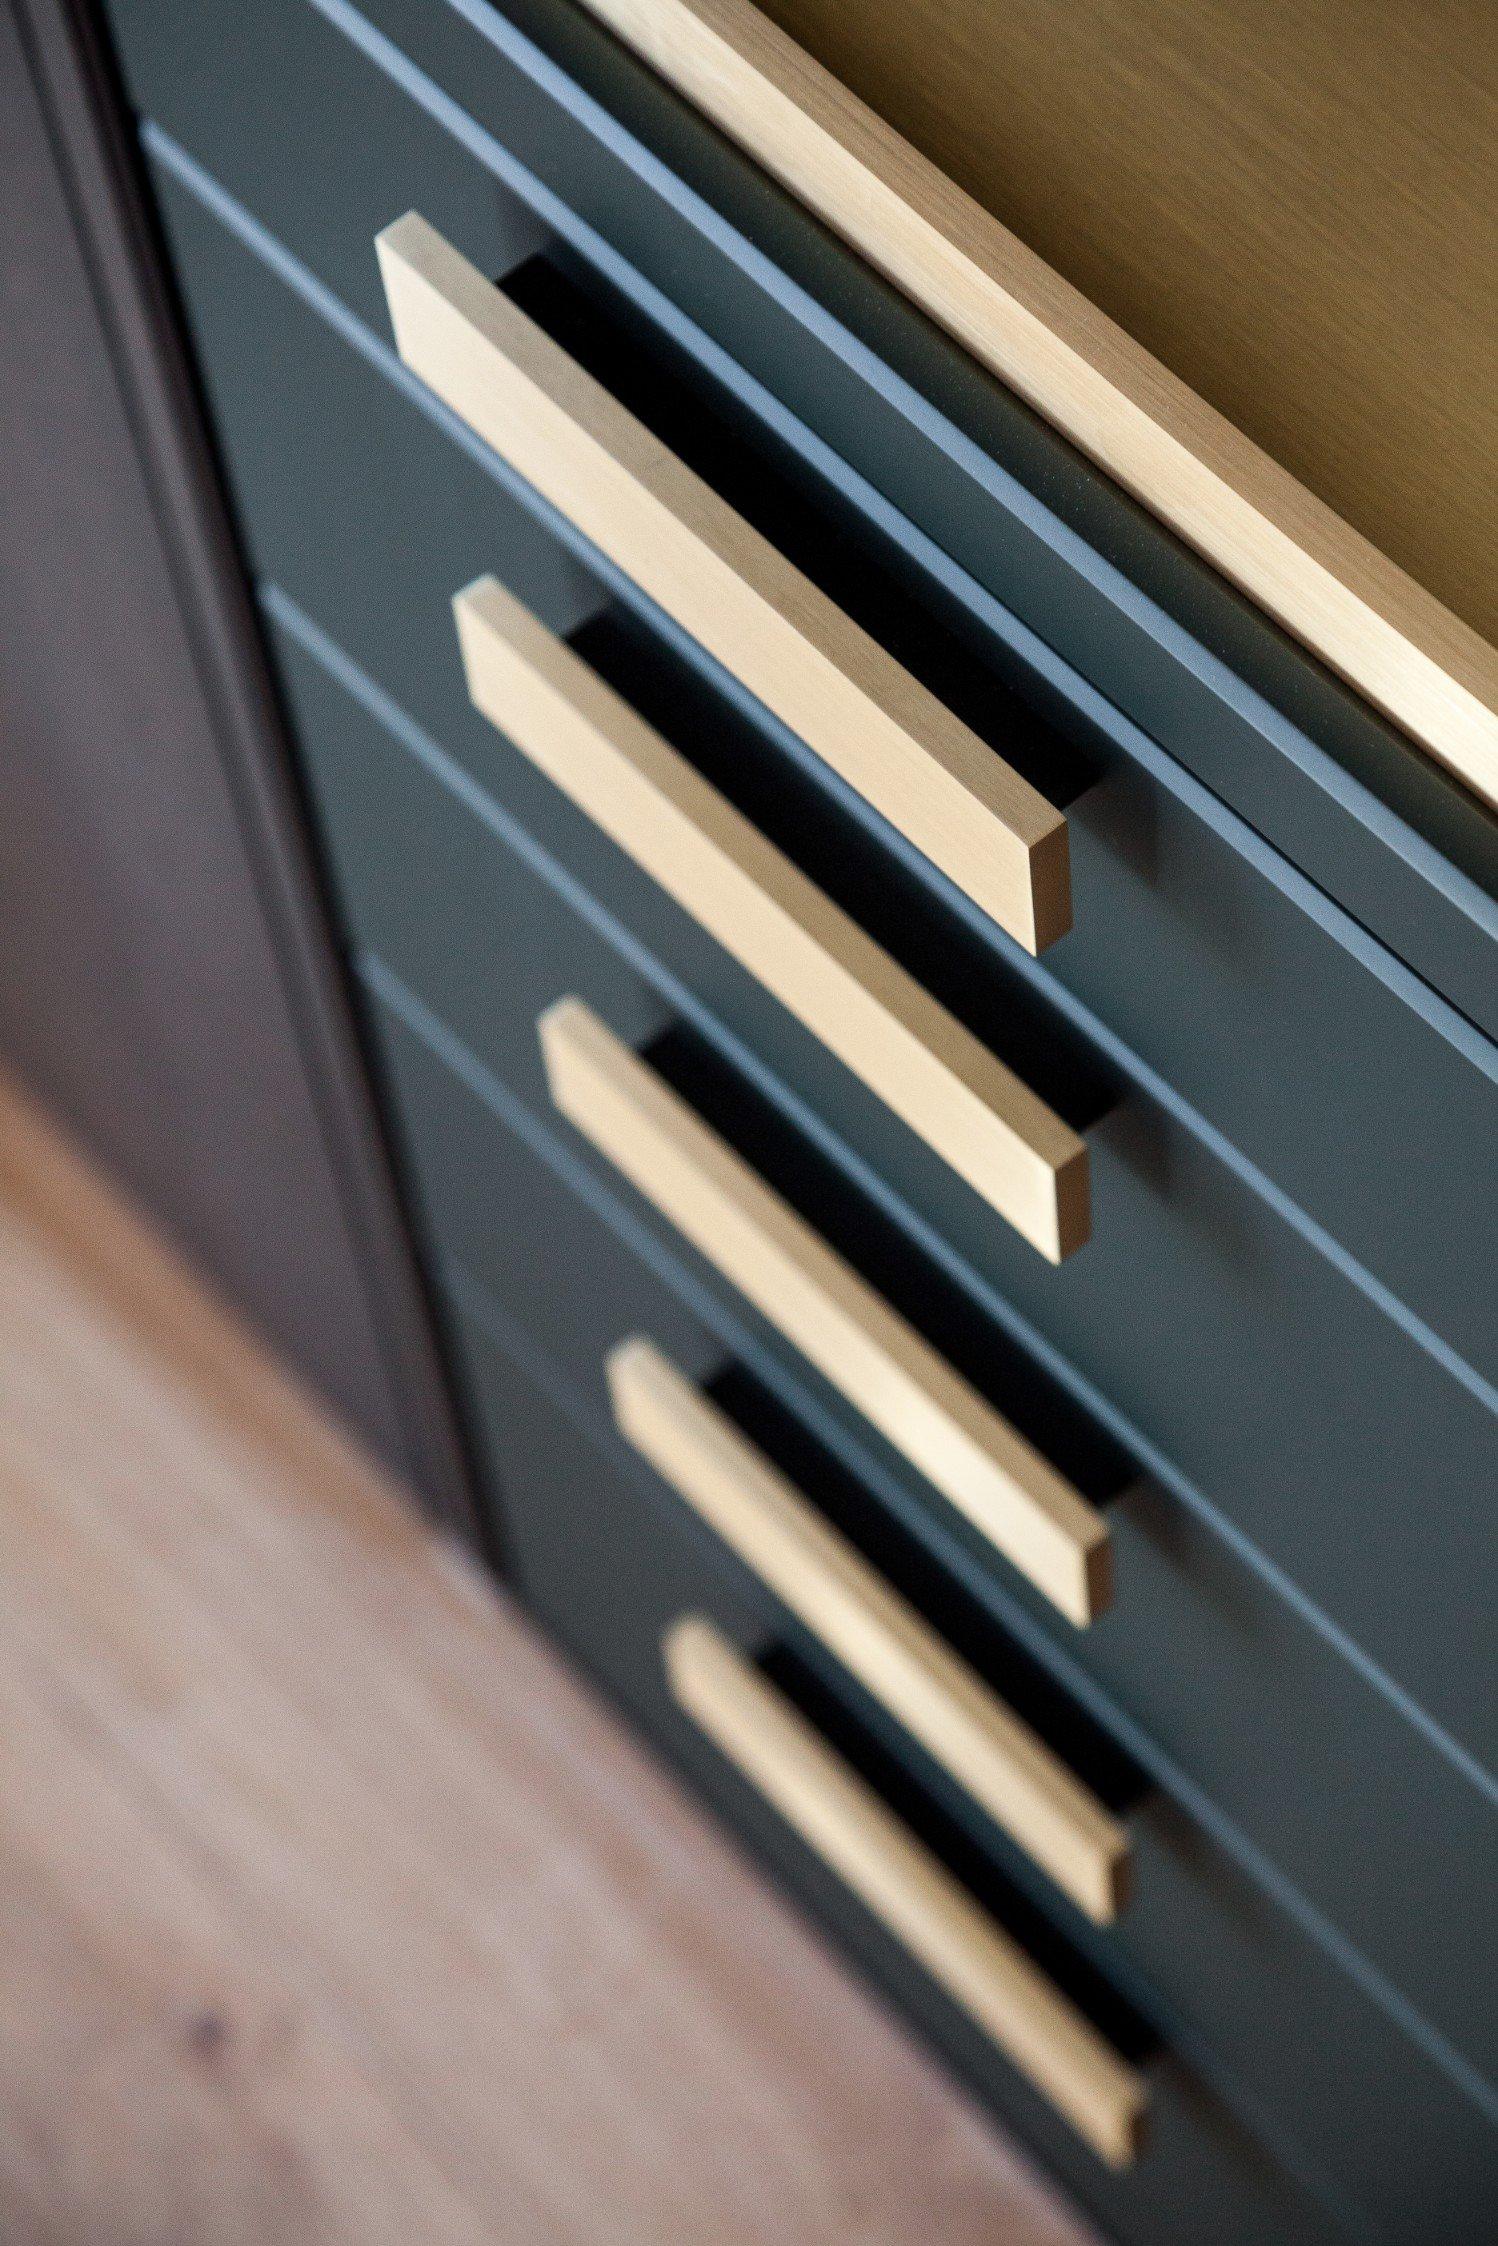 Rietveldprojects-penthouse-appartement-design-architectuur-kust50